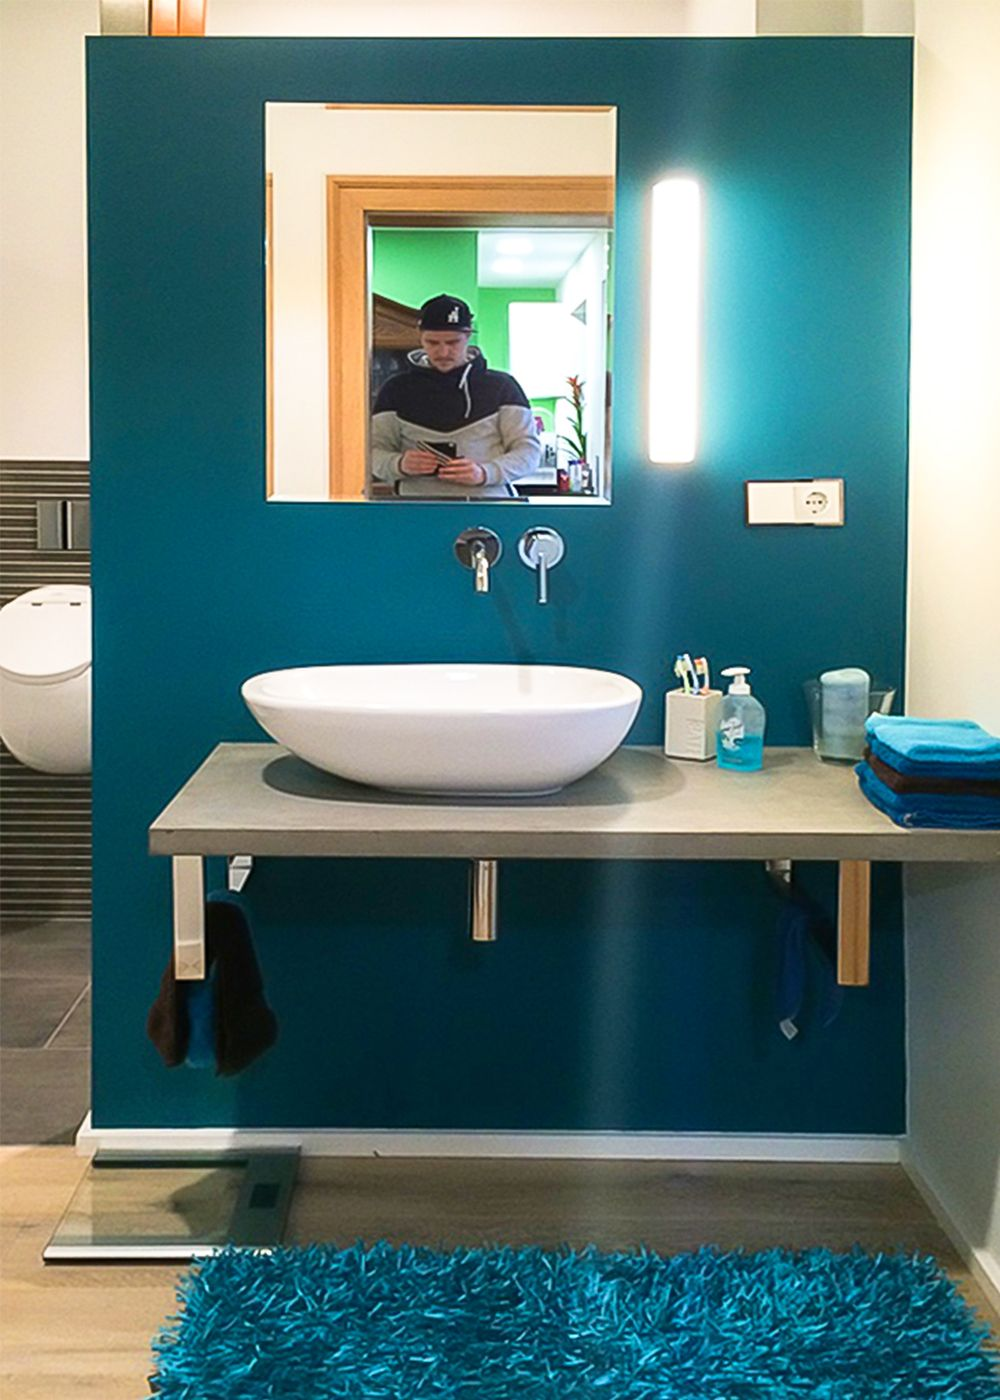 Schmuckwand Im Badezimmer Petrol Wandgestaltung Hingucker Türkis